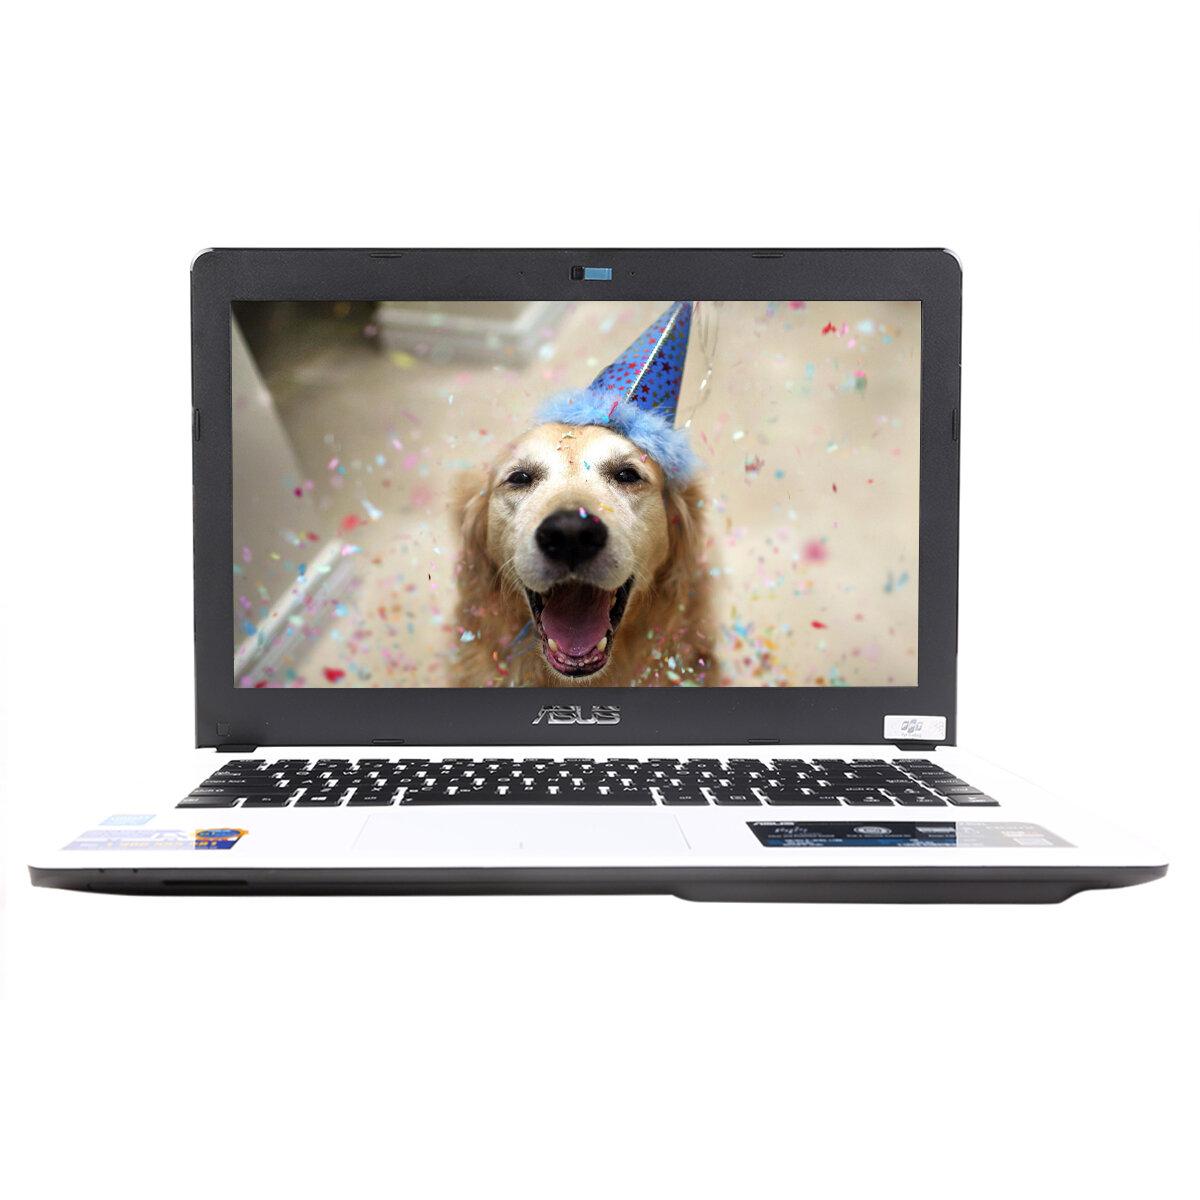 Laptop Asus X452LAV-VX220D -  Intel Haswell Core I3-4030U 1.9Ghz, 2GB DDR3, 500GB HDD, Intel HD Graphics 4000